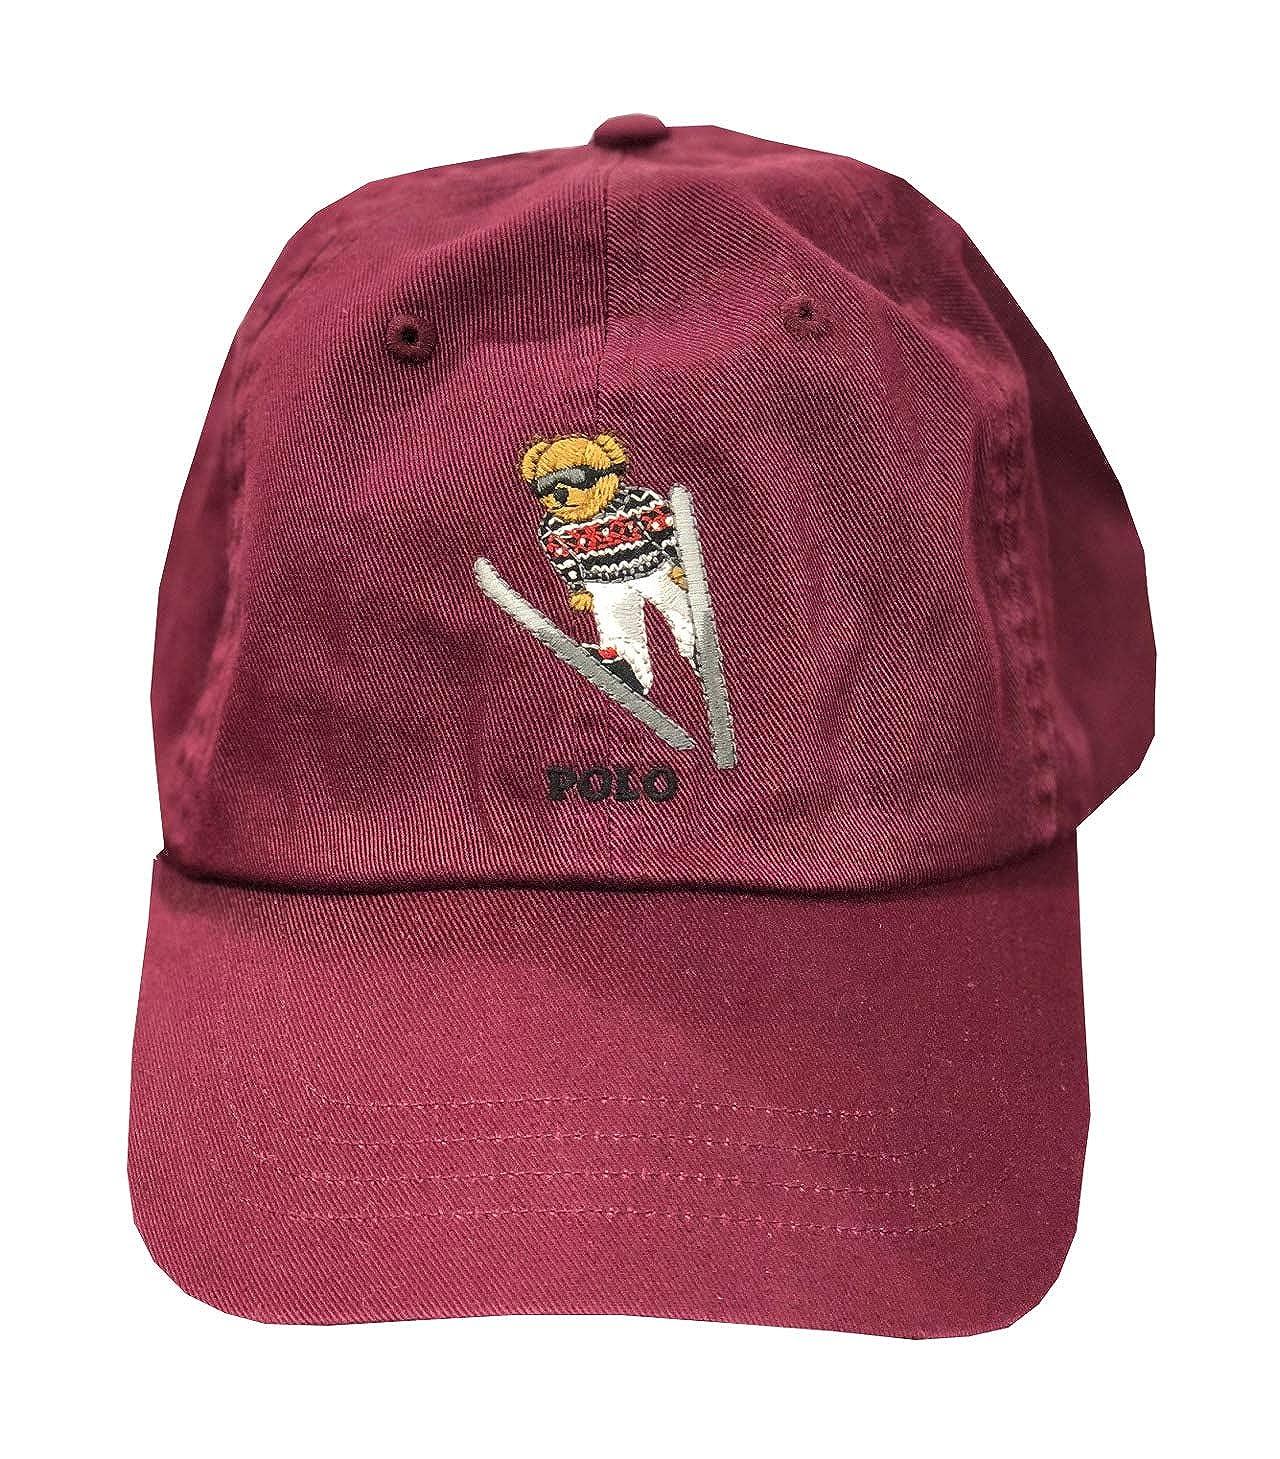 552f9bf514 Amazon.com  Polo Ralph Lauren Men s Polo Bear Skier Adjustable Baseball Hat  Cap - Burgundy  Clothing